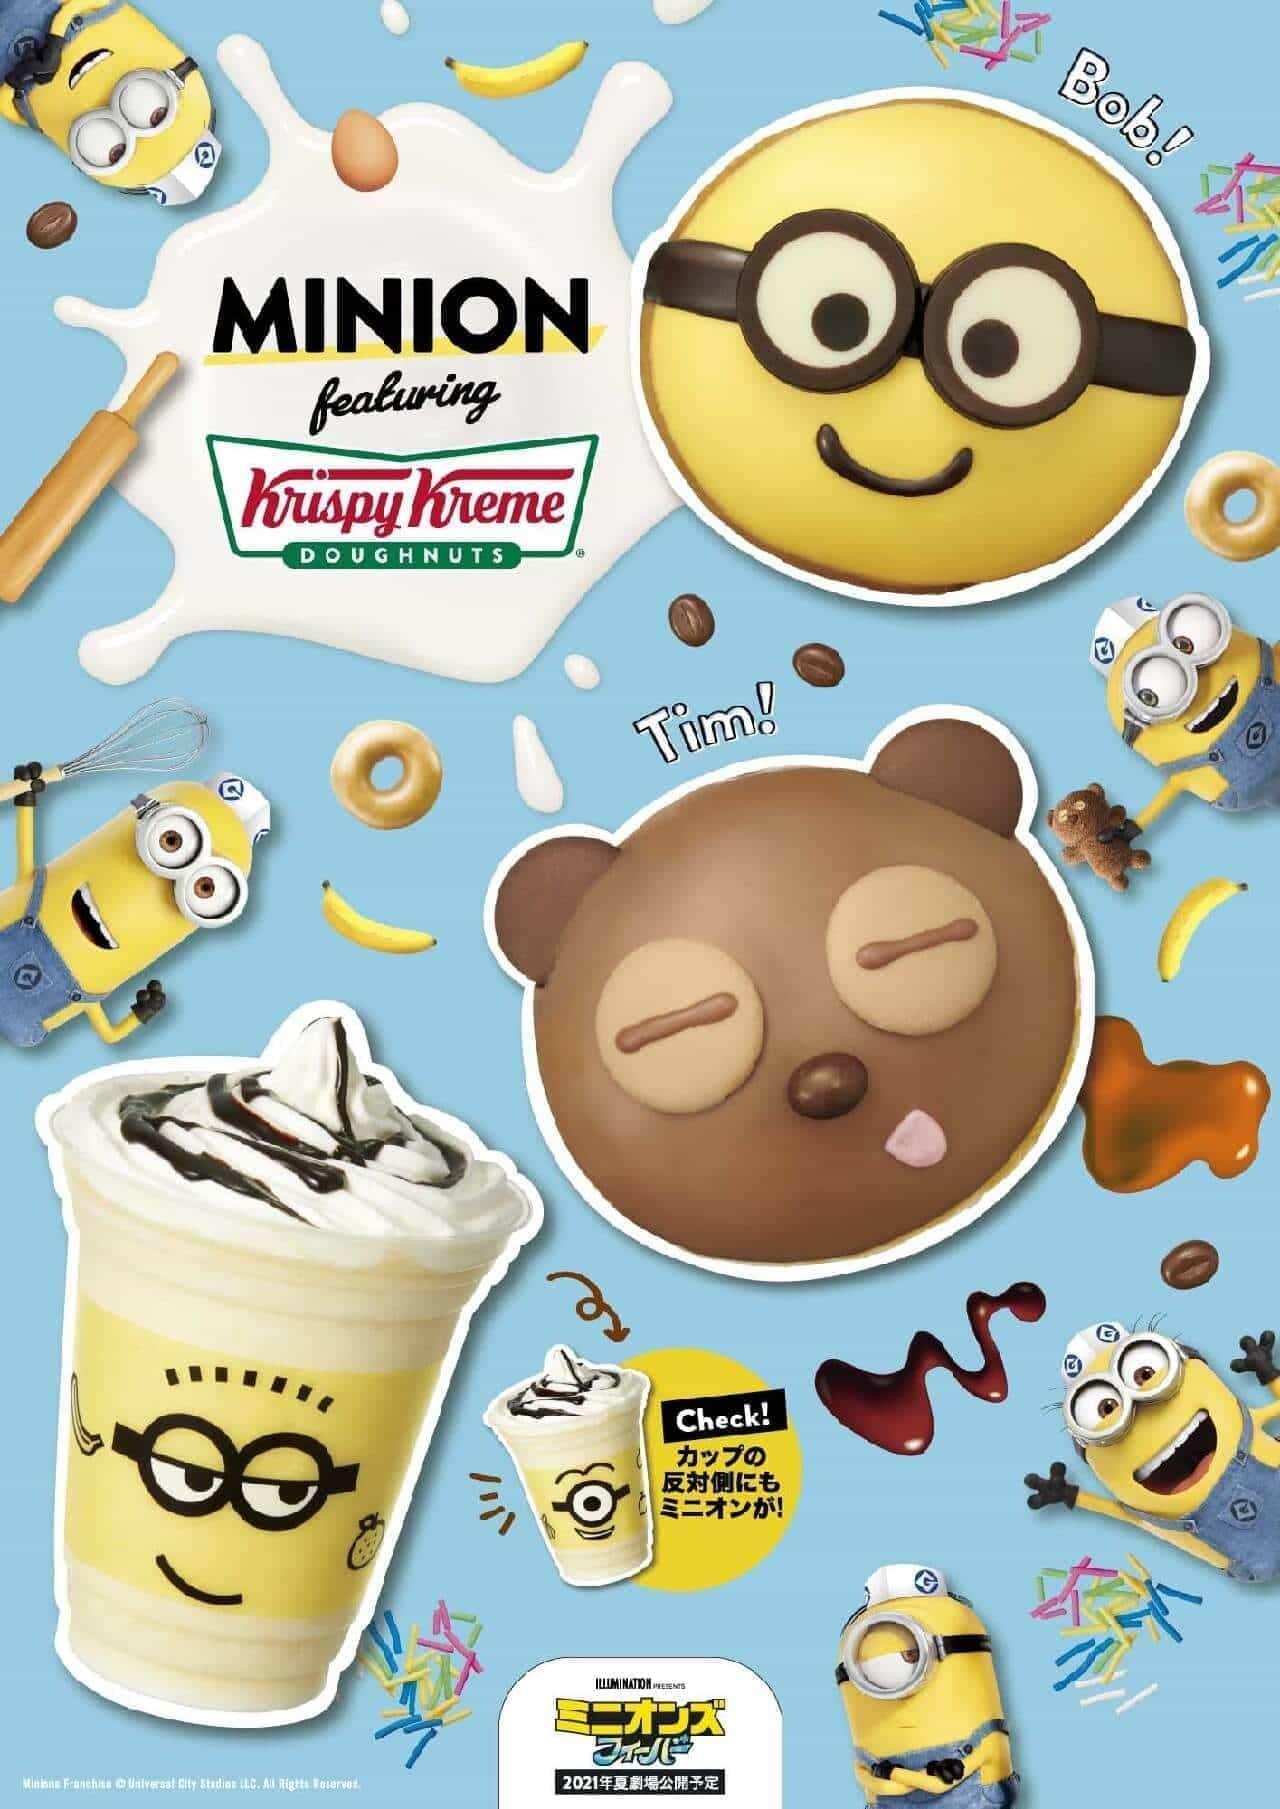 KKD×ミニオン「バナナミルク ボブ」「キャラメルチョコ ティム」